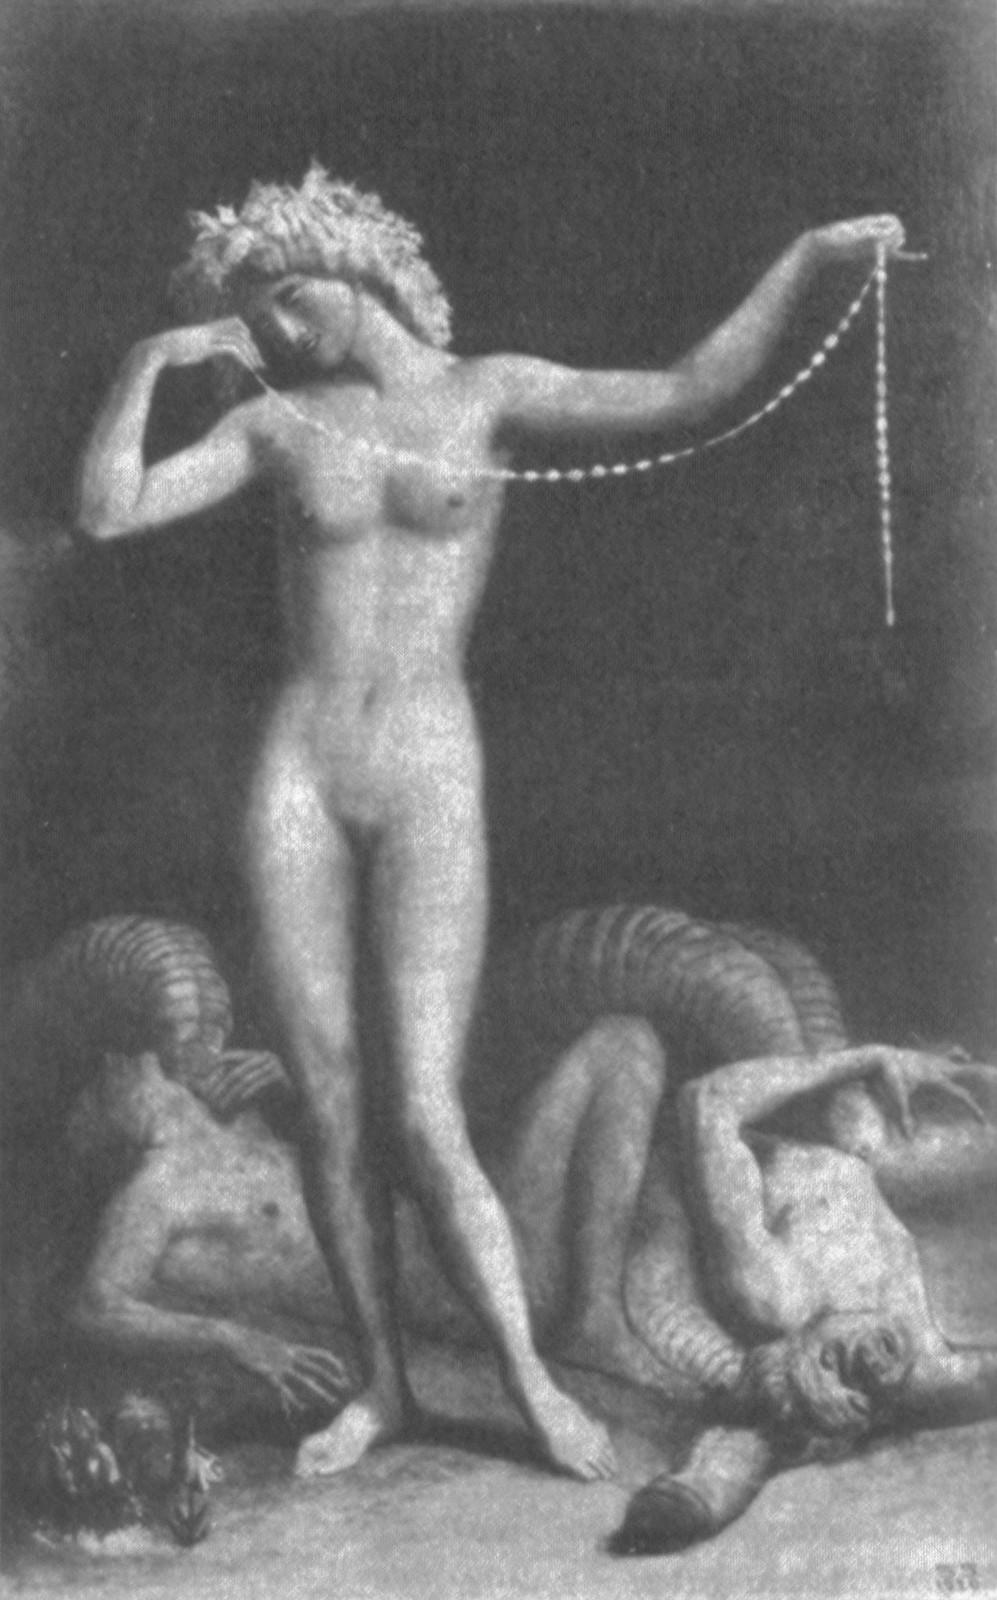 Sascha Schneider - Triumph of the Woman, 1920